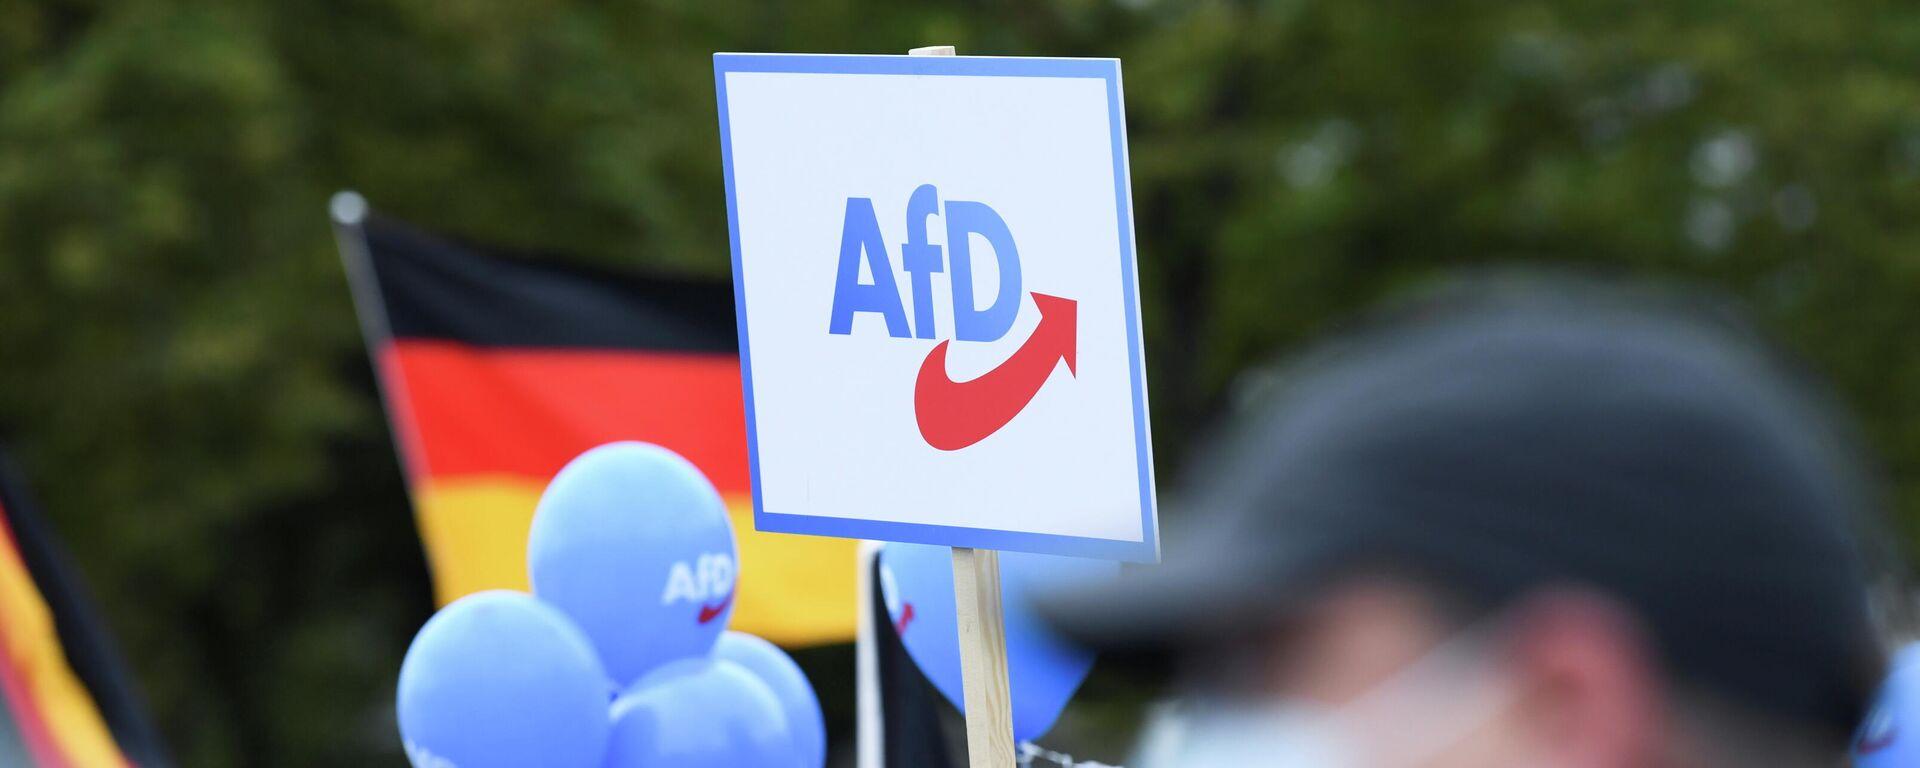 Wahlkampf-Veranstaltung der AfD - SNA, 1920, 29.09.2021